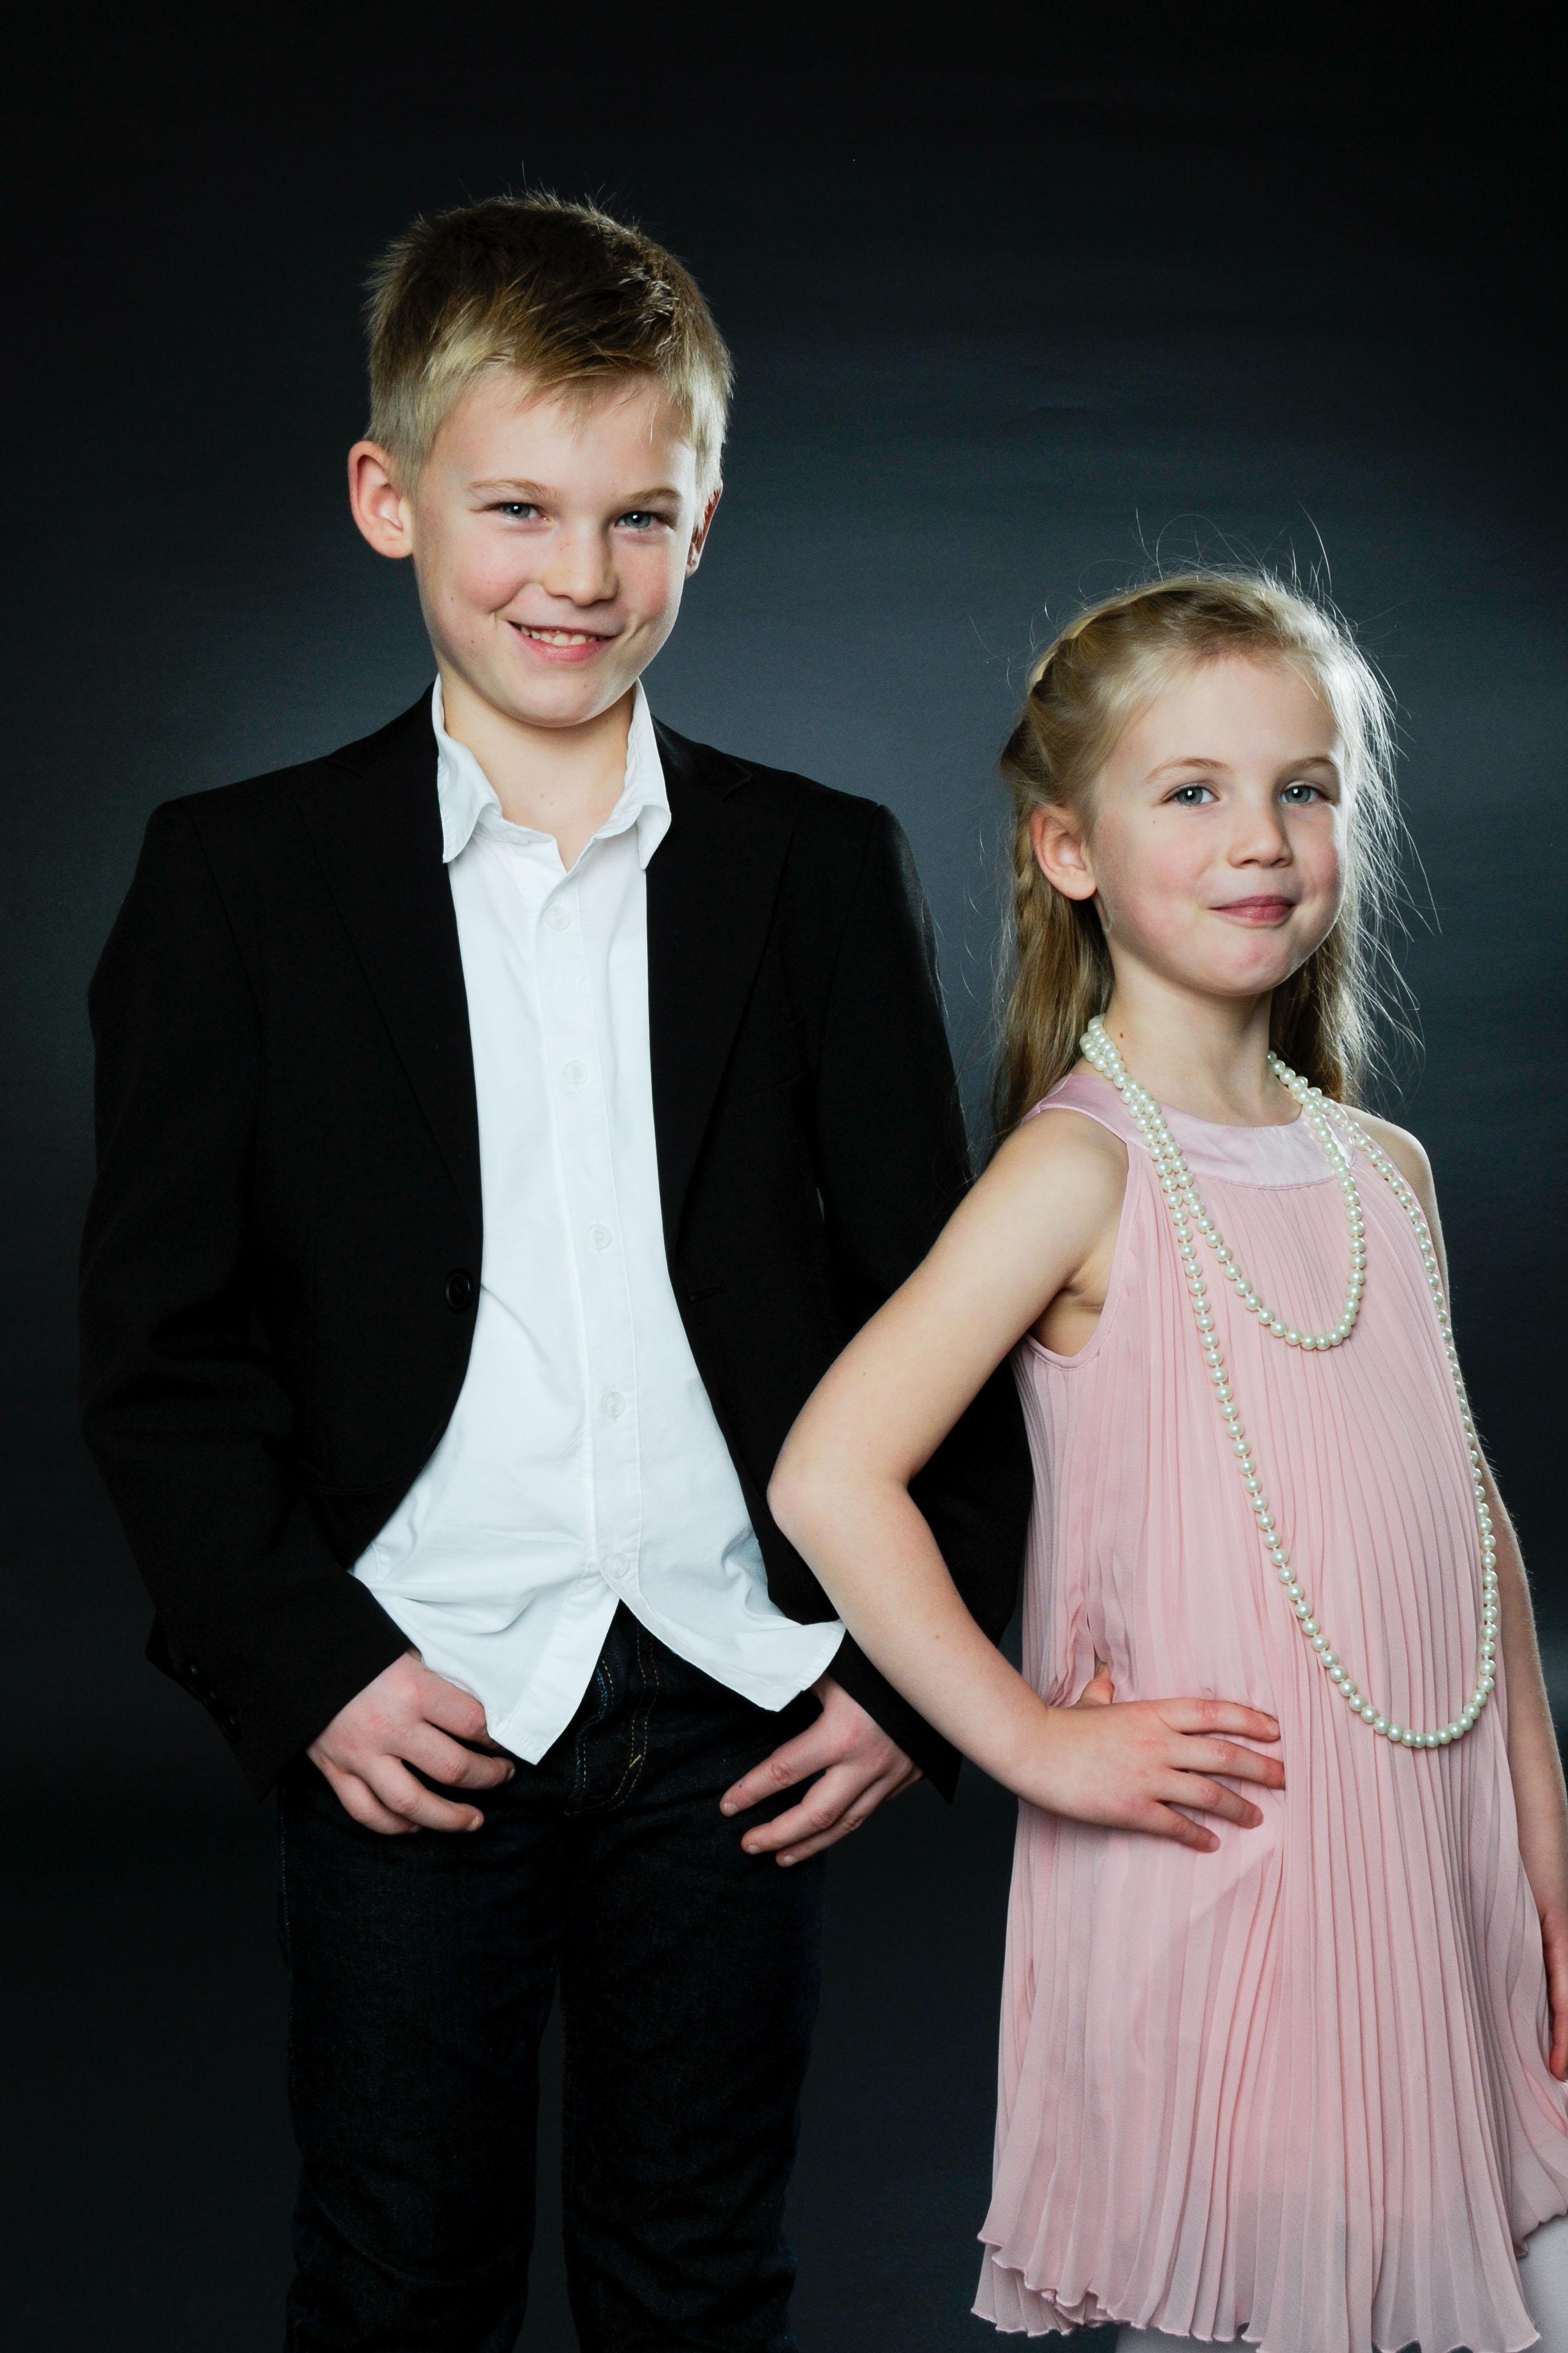 Kinderfotografie_Nadine Grenningloh009